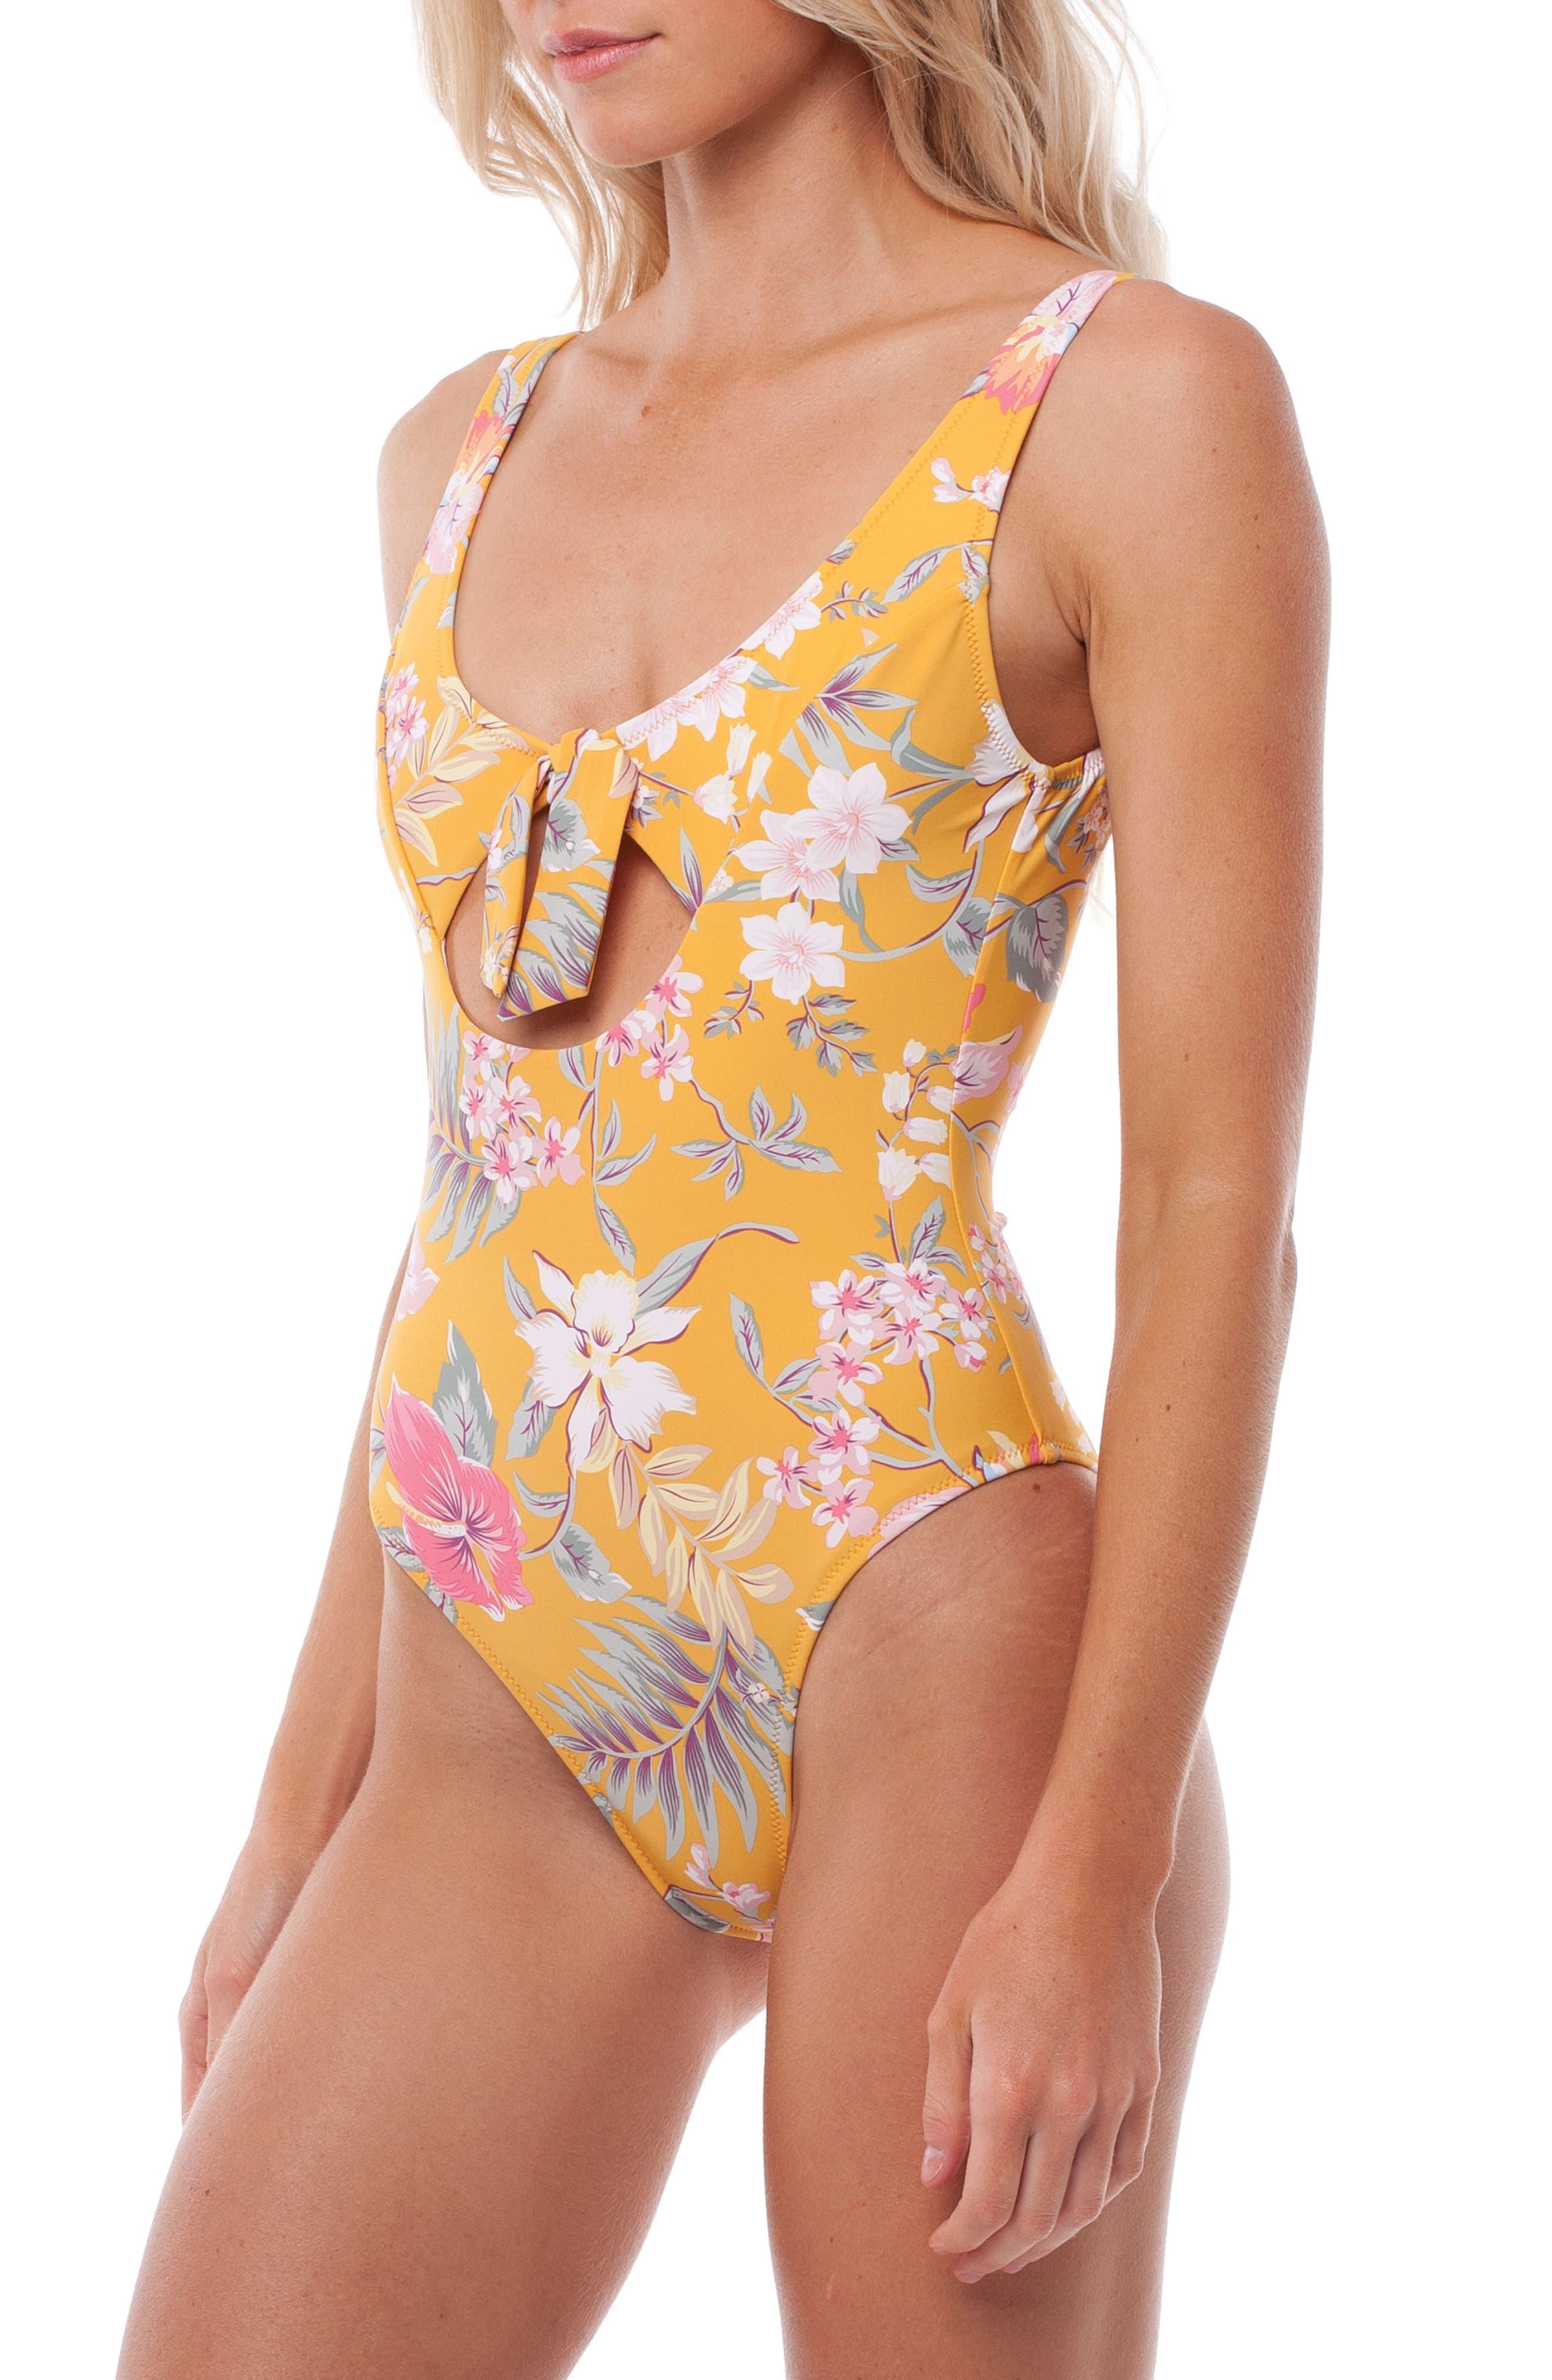 Aruba One-Piece Swimsuit,                             Alternate thumbnail 2, color,                             MARIGOLD